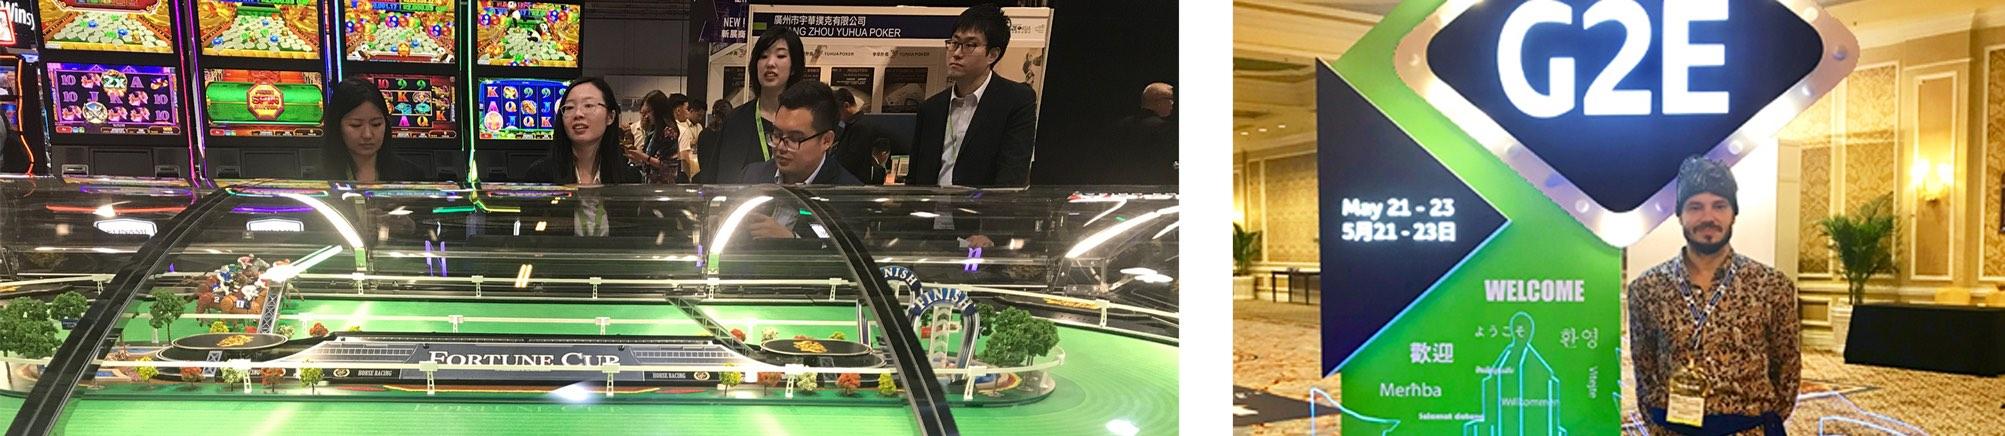 SmartCasinoGuide komanda in G2E tiešsaistes spēļu konference